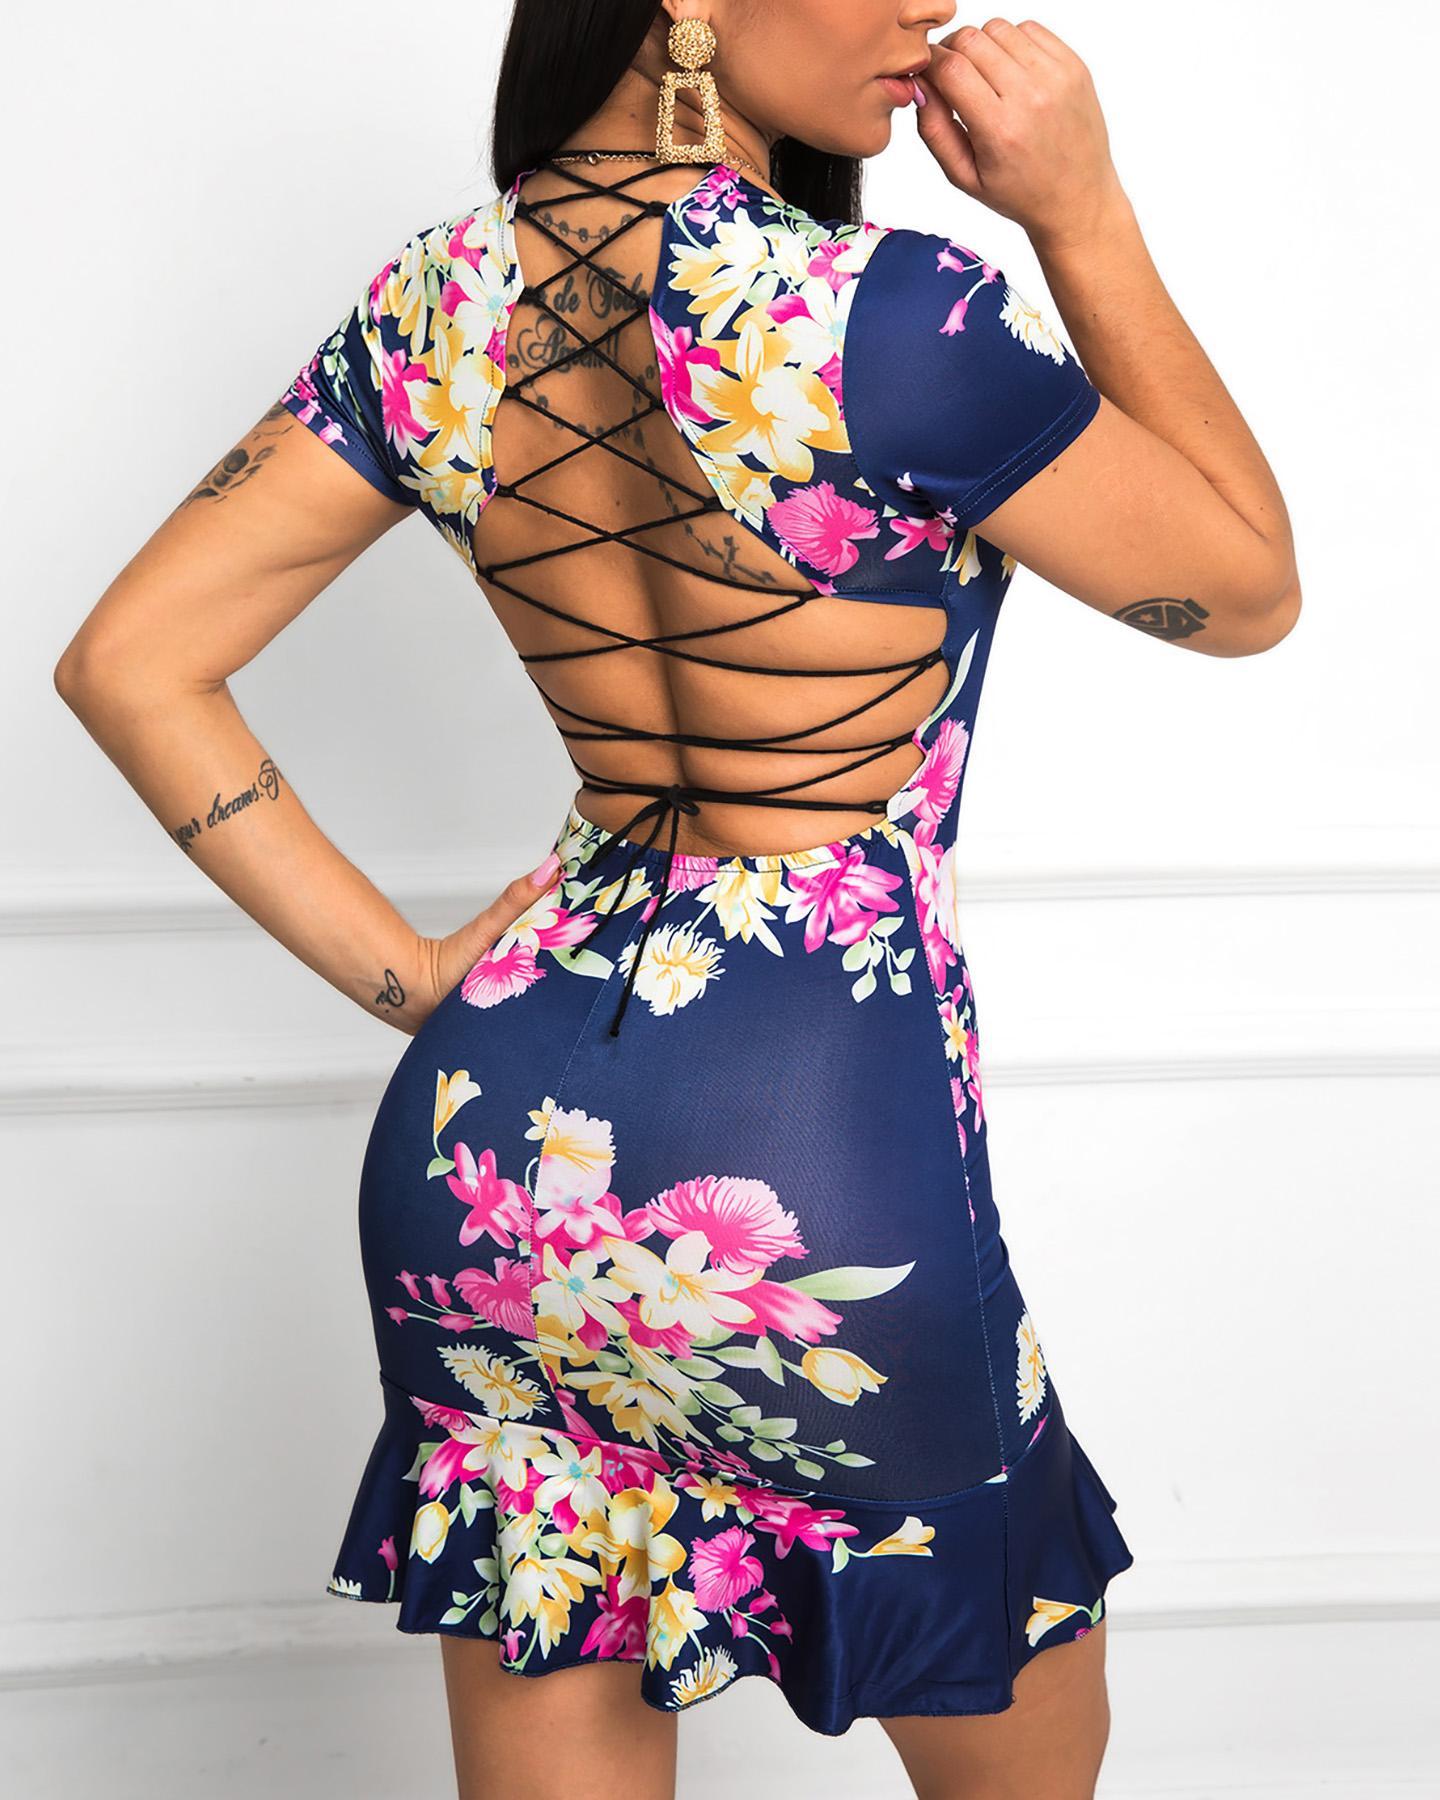 Ruffles Lace-Up Back Bodycon Print Dress